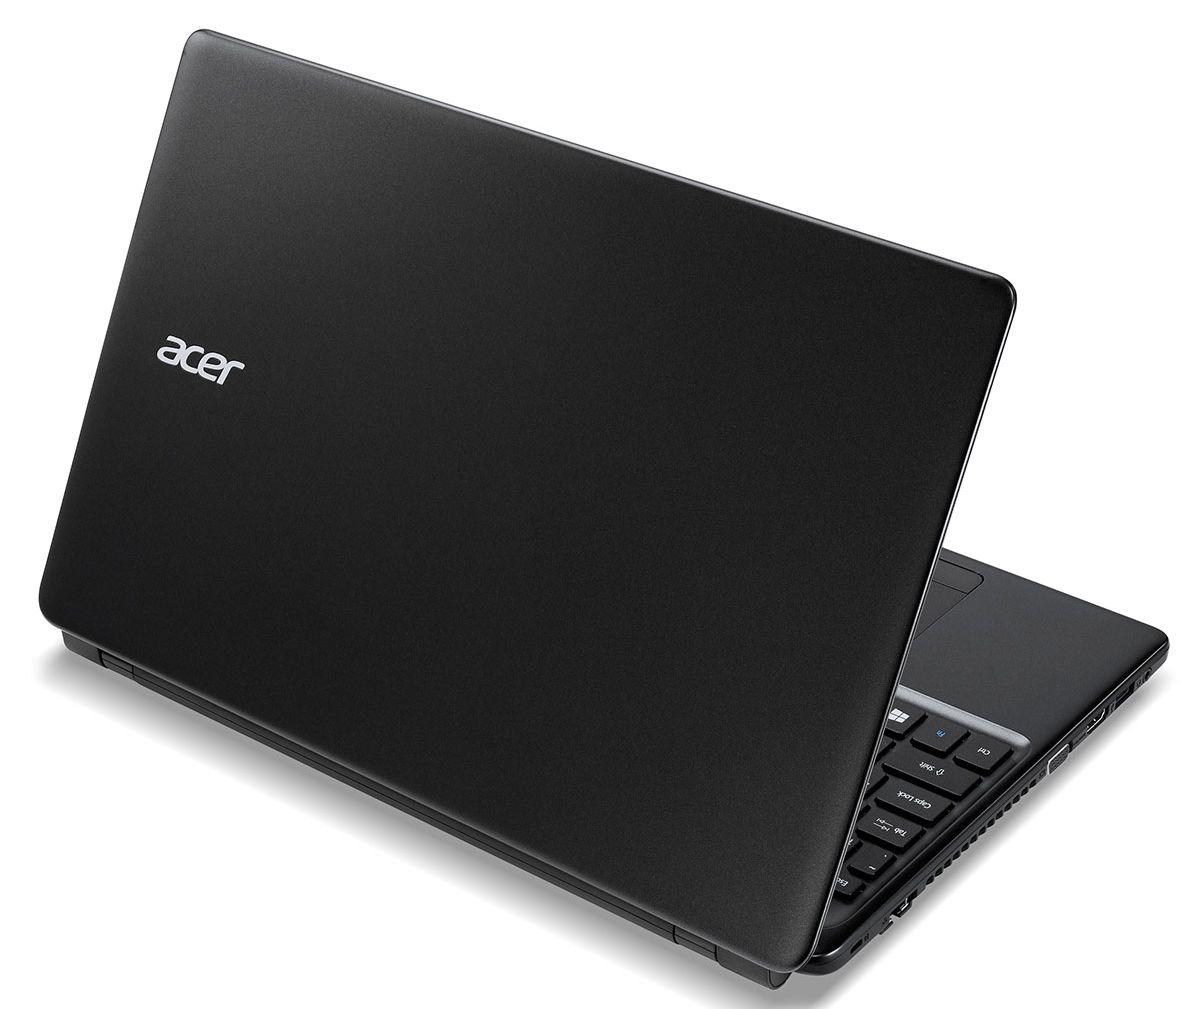 "<span class=""toptagtitre"">Bon plan 340€ ! </span>Acer Aspire E1-572-34014G50Mnkk, 15.6"" à 449€ avec Core i3 Haswell, 500 Go"